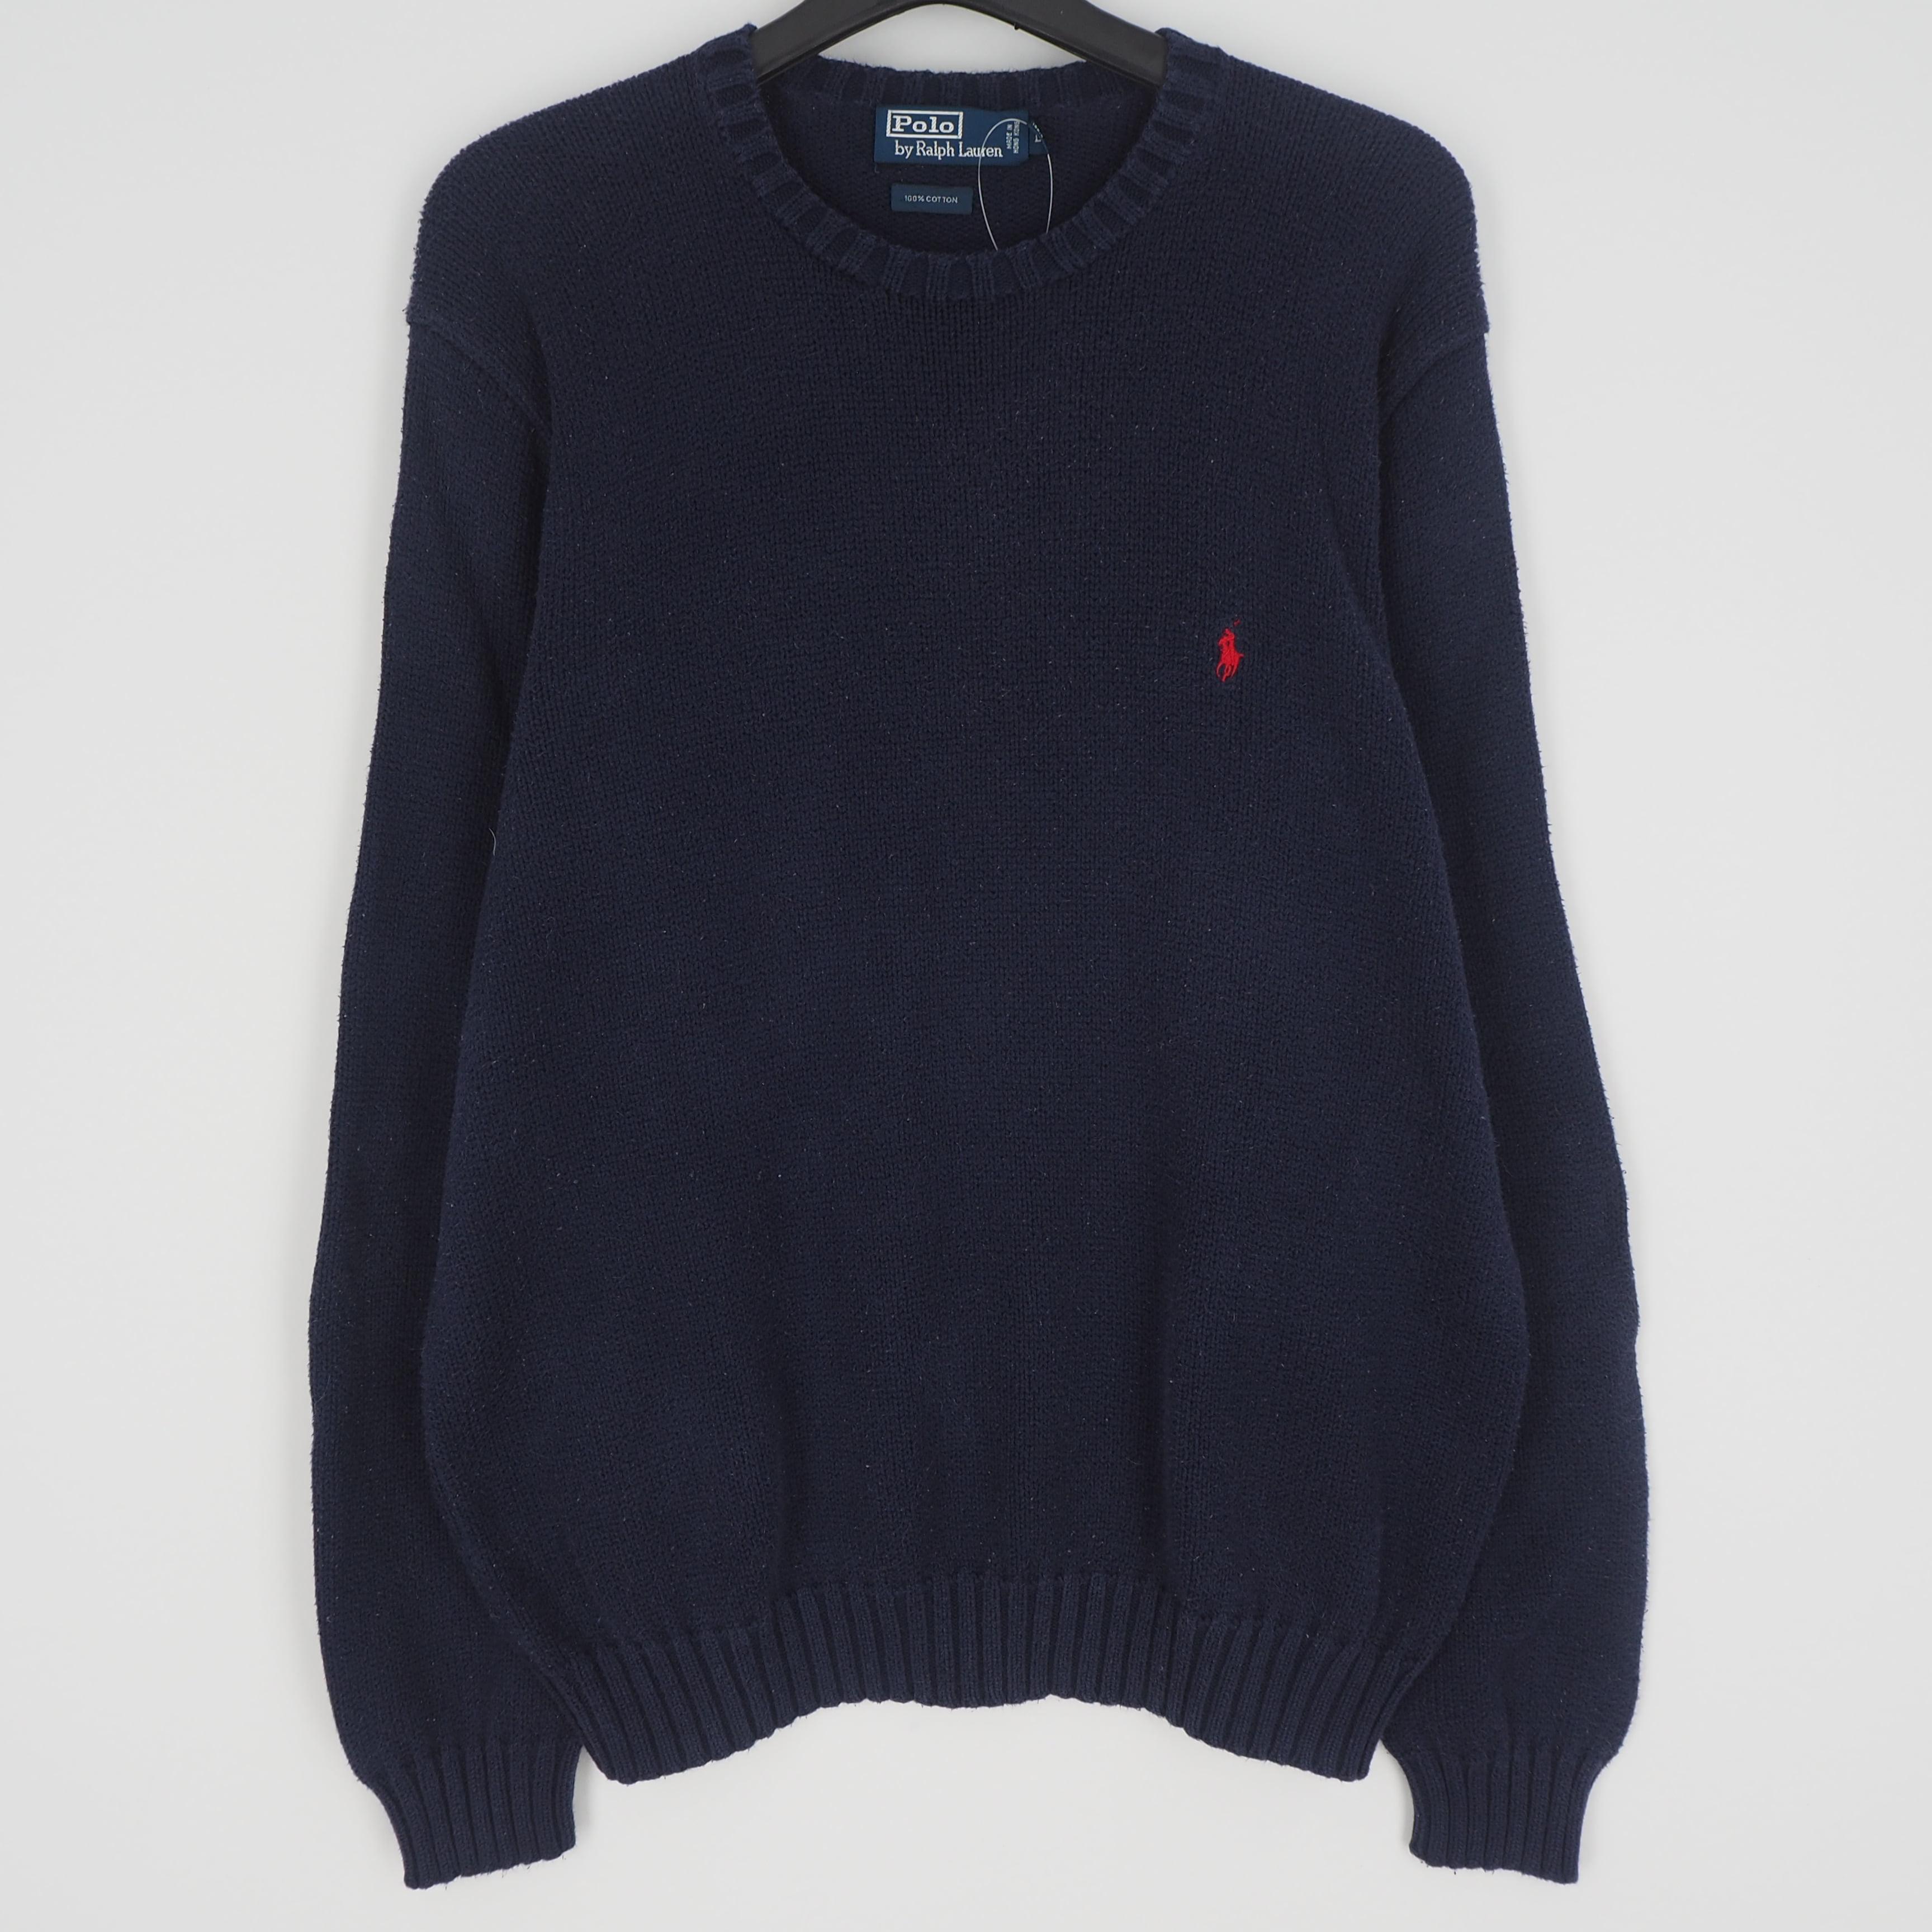 [XL] 랄프로렌 긴팔 니트/스웨터